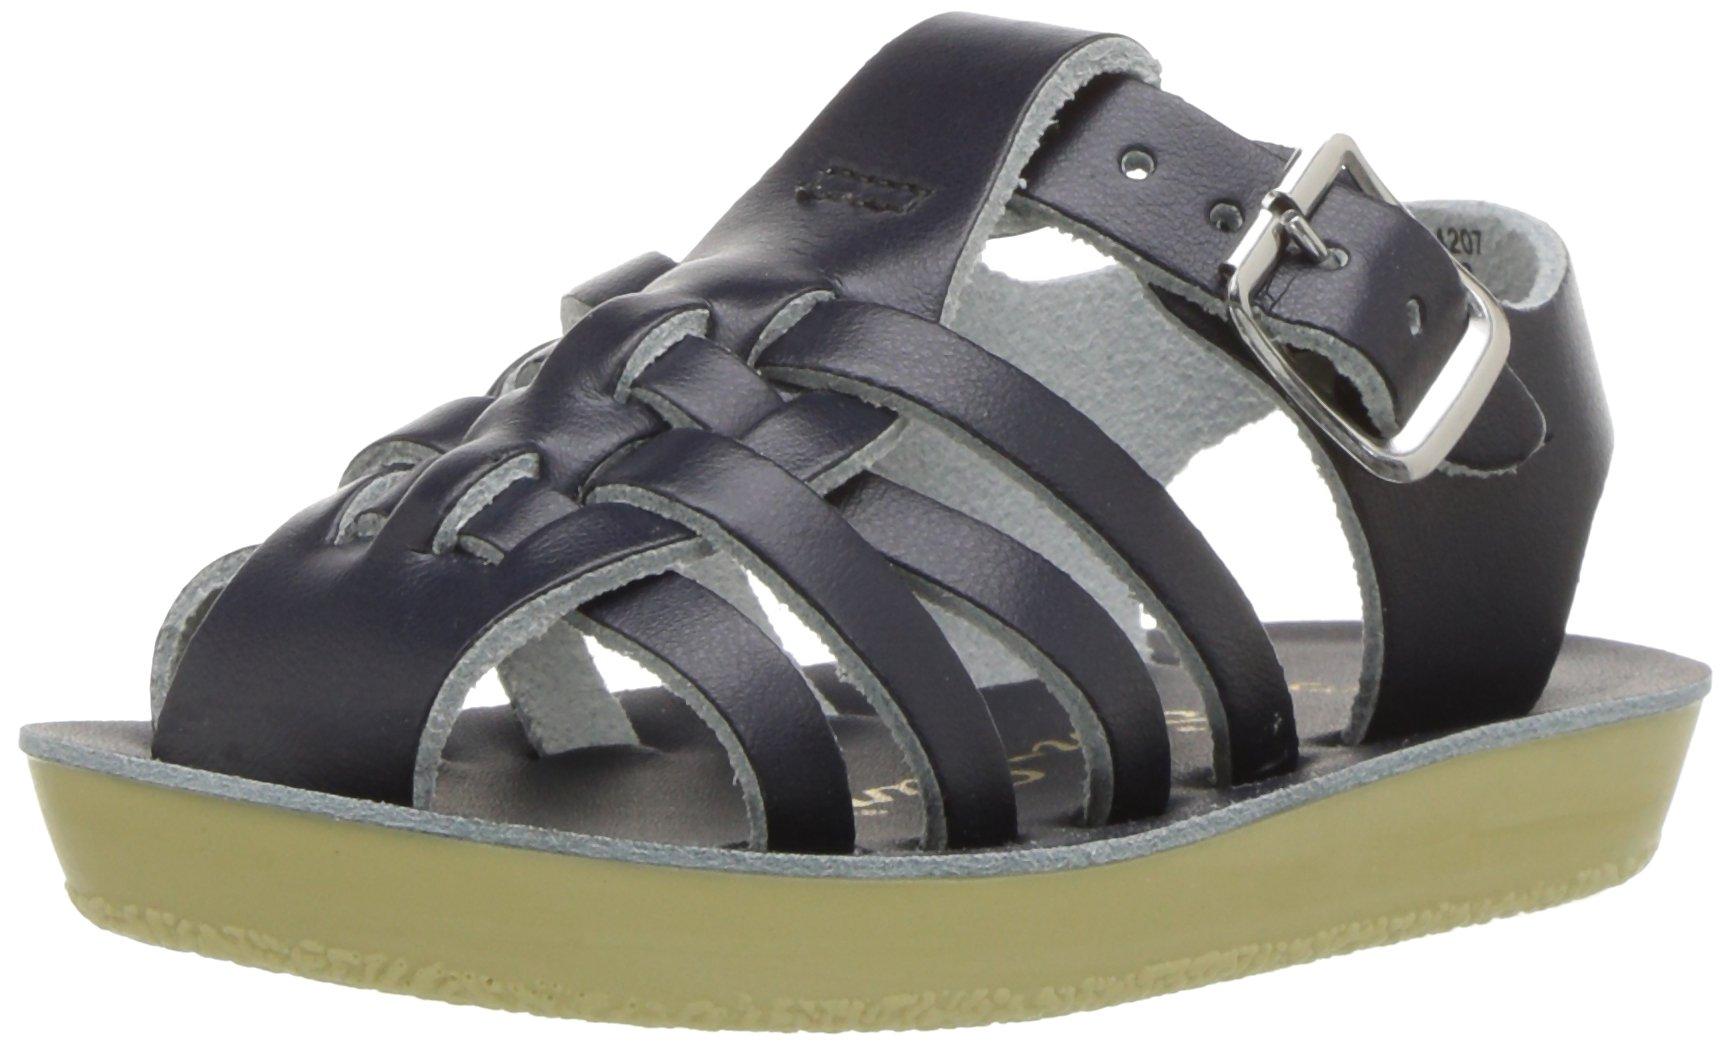 Salt Water Sandals by HOY Shoe Baby Sun-San Sailor Flat Sandal Navy 6 M US Toddler by Salt Water Sandals